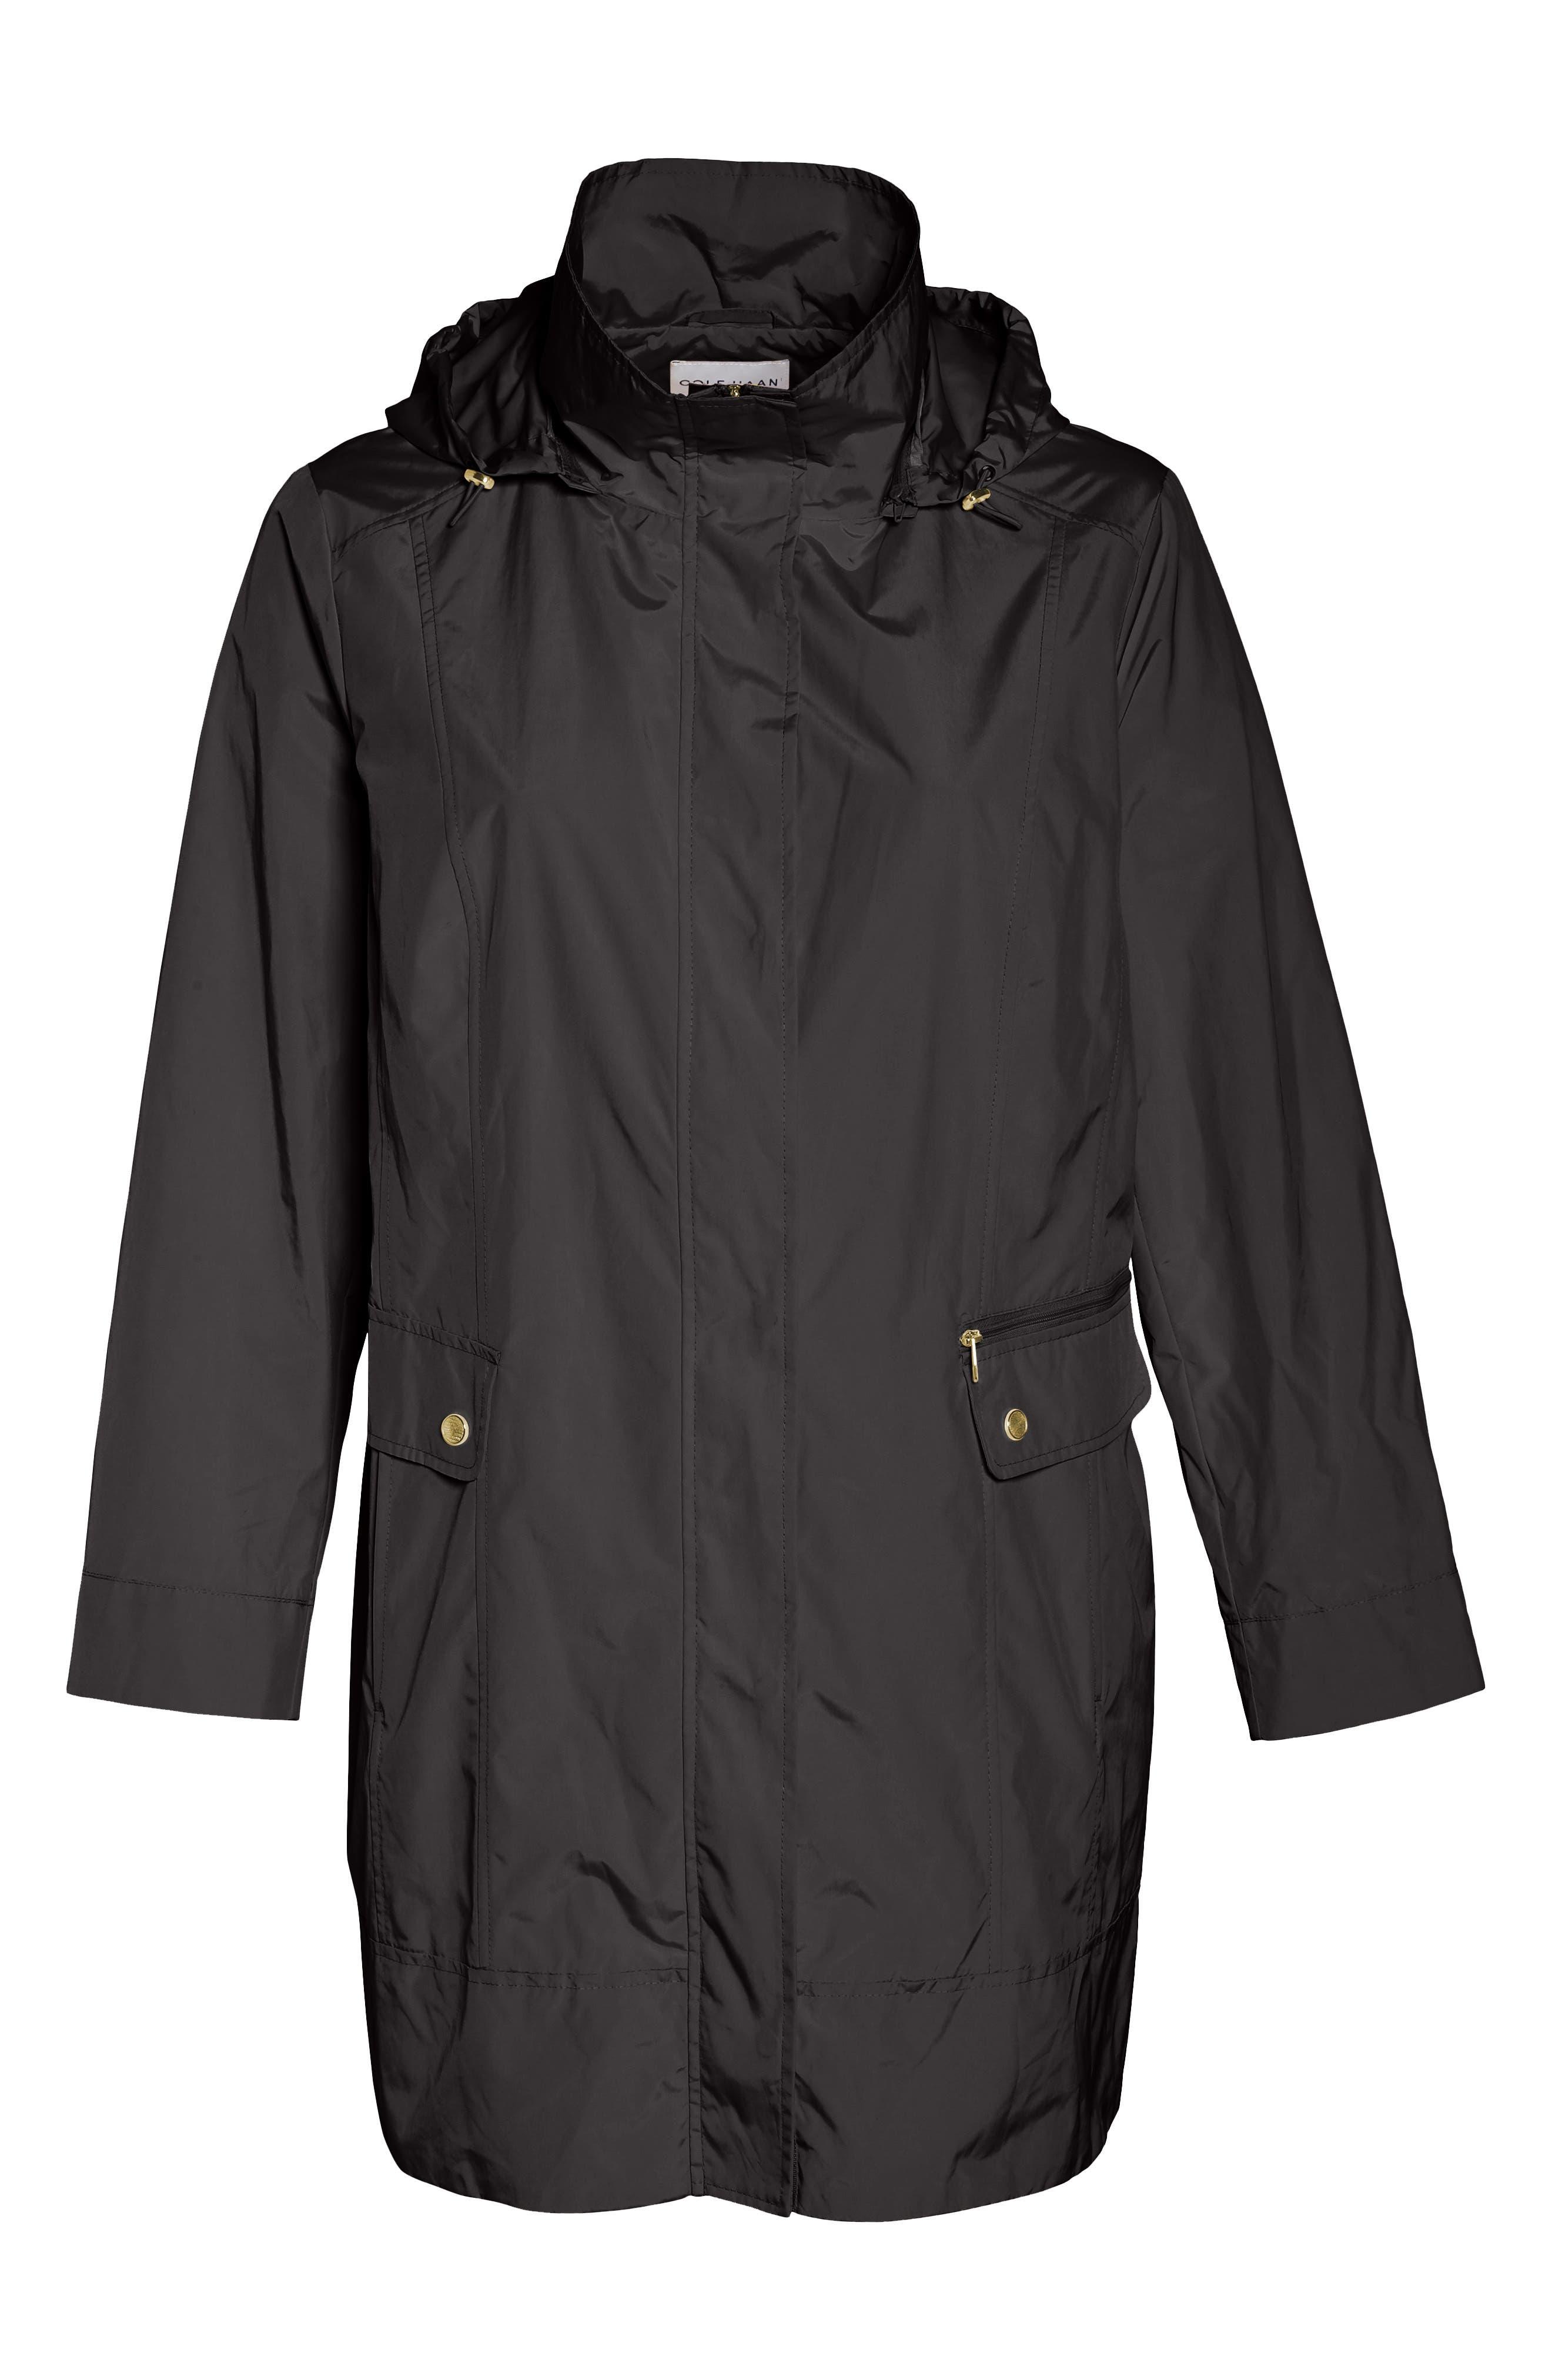 Cole Haan Water Resistant Rain Jacket,                         Main,                         color, Black